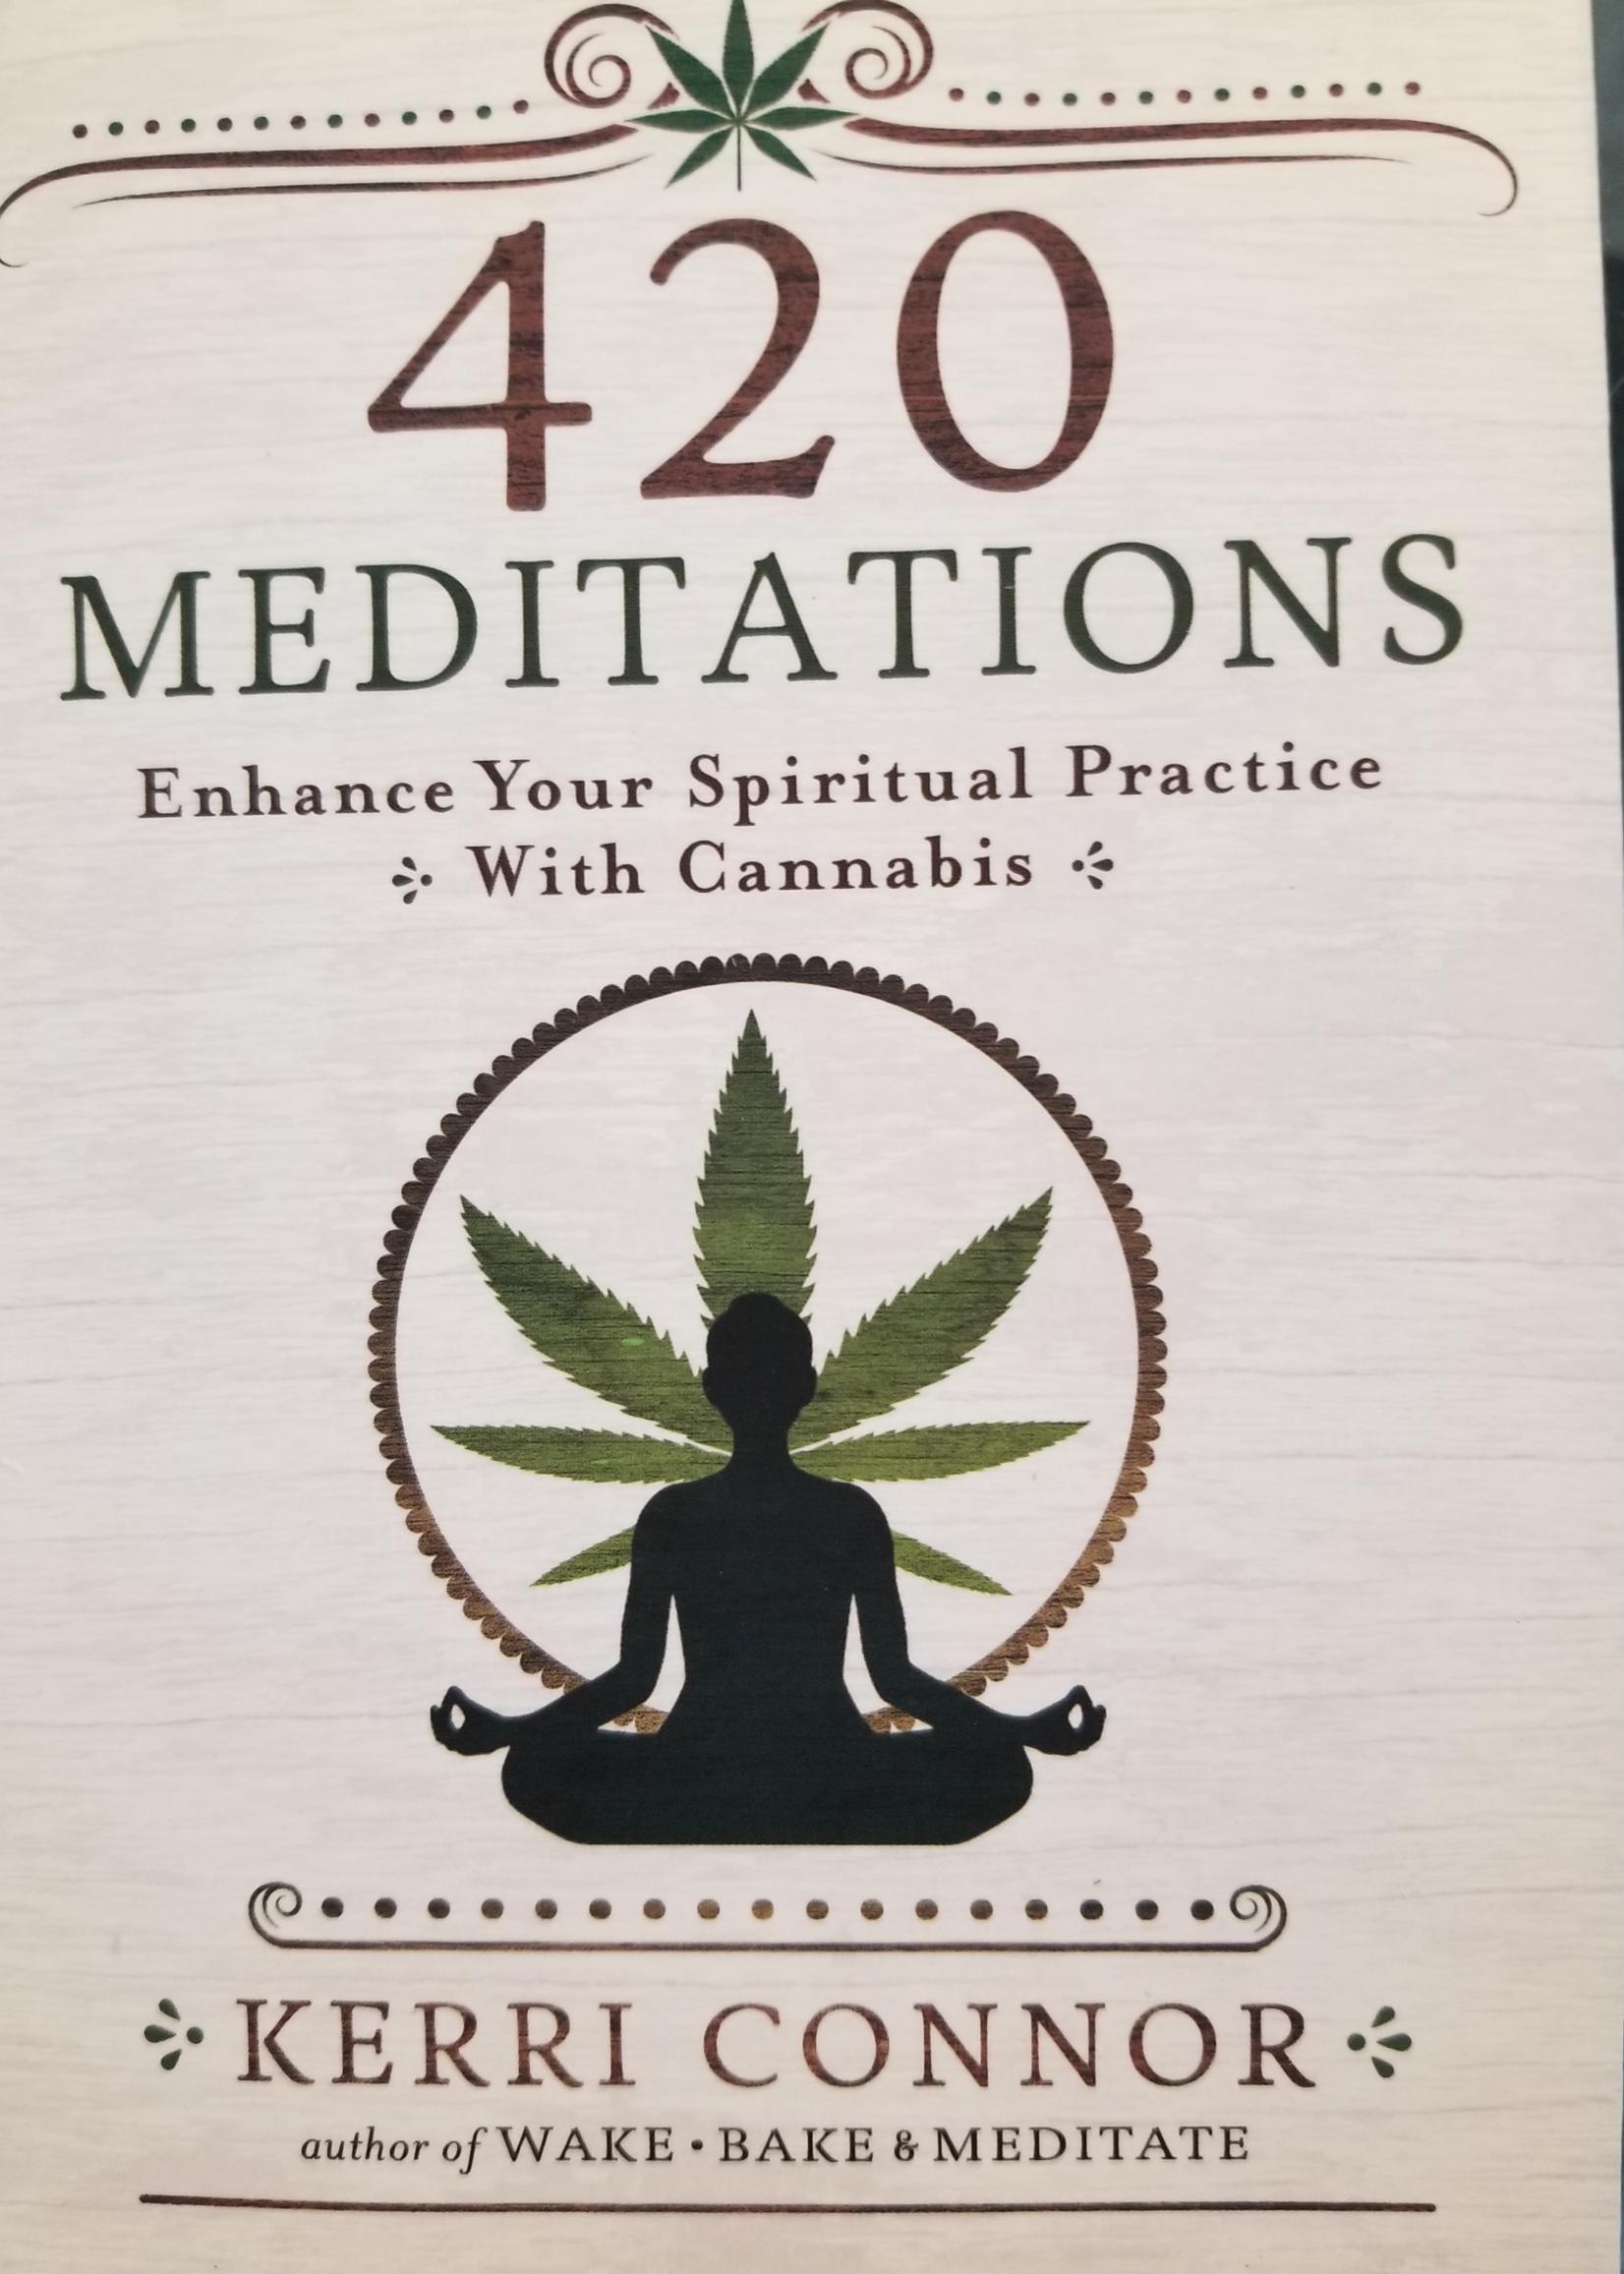 420 Meditations -  BY KERRI CONNOR